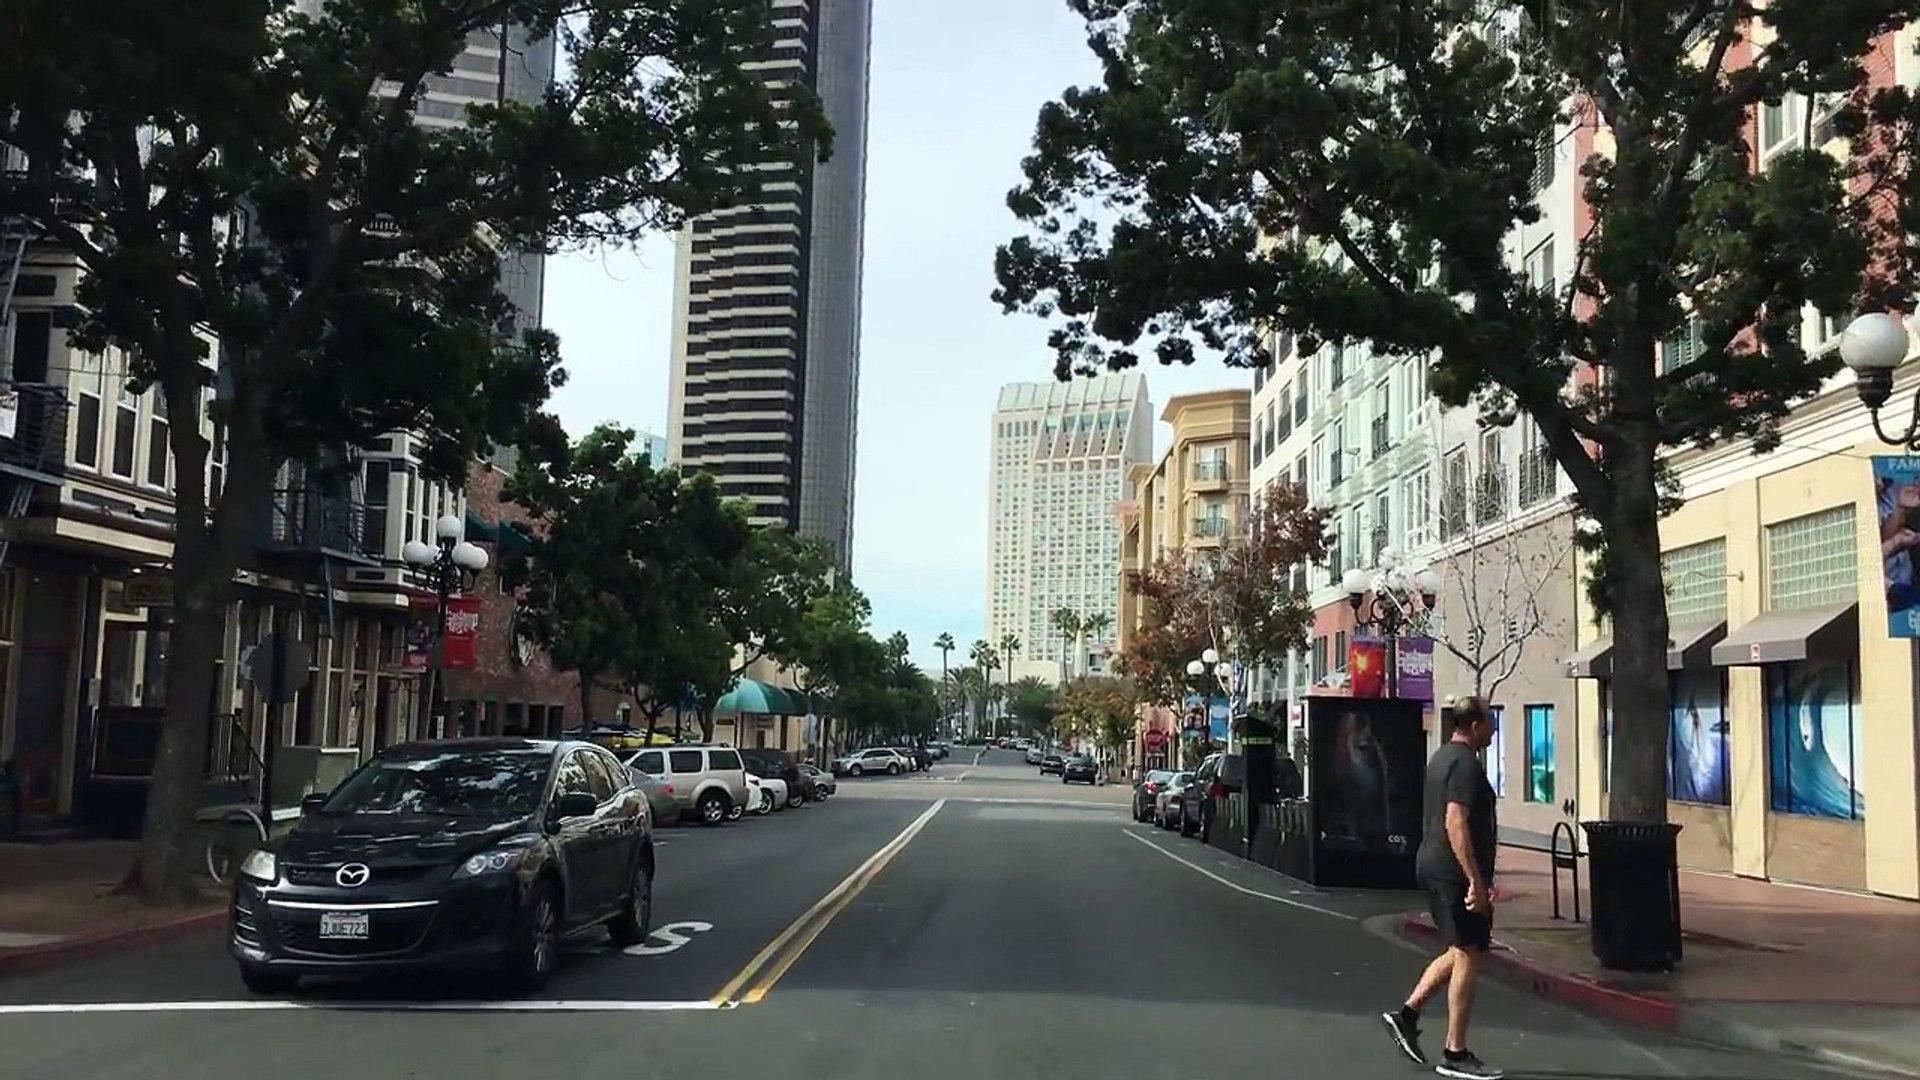 Driving Downtown - San Diegos Gaslamp Quarter - San Diego California USA